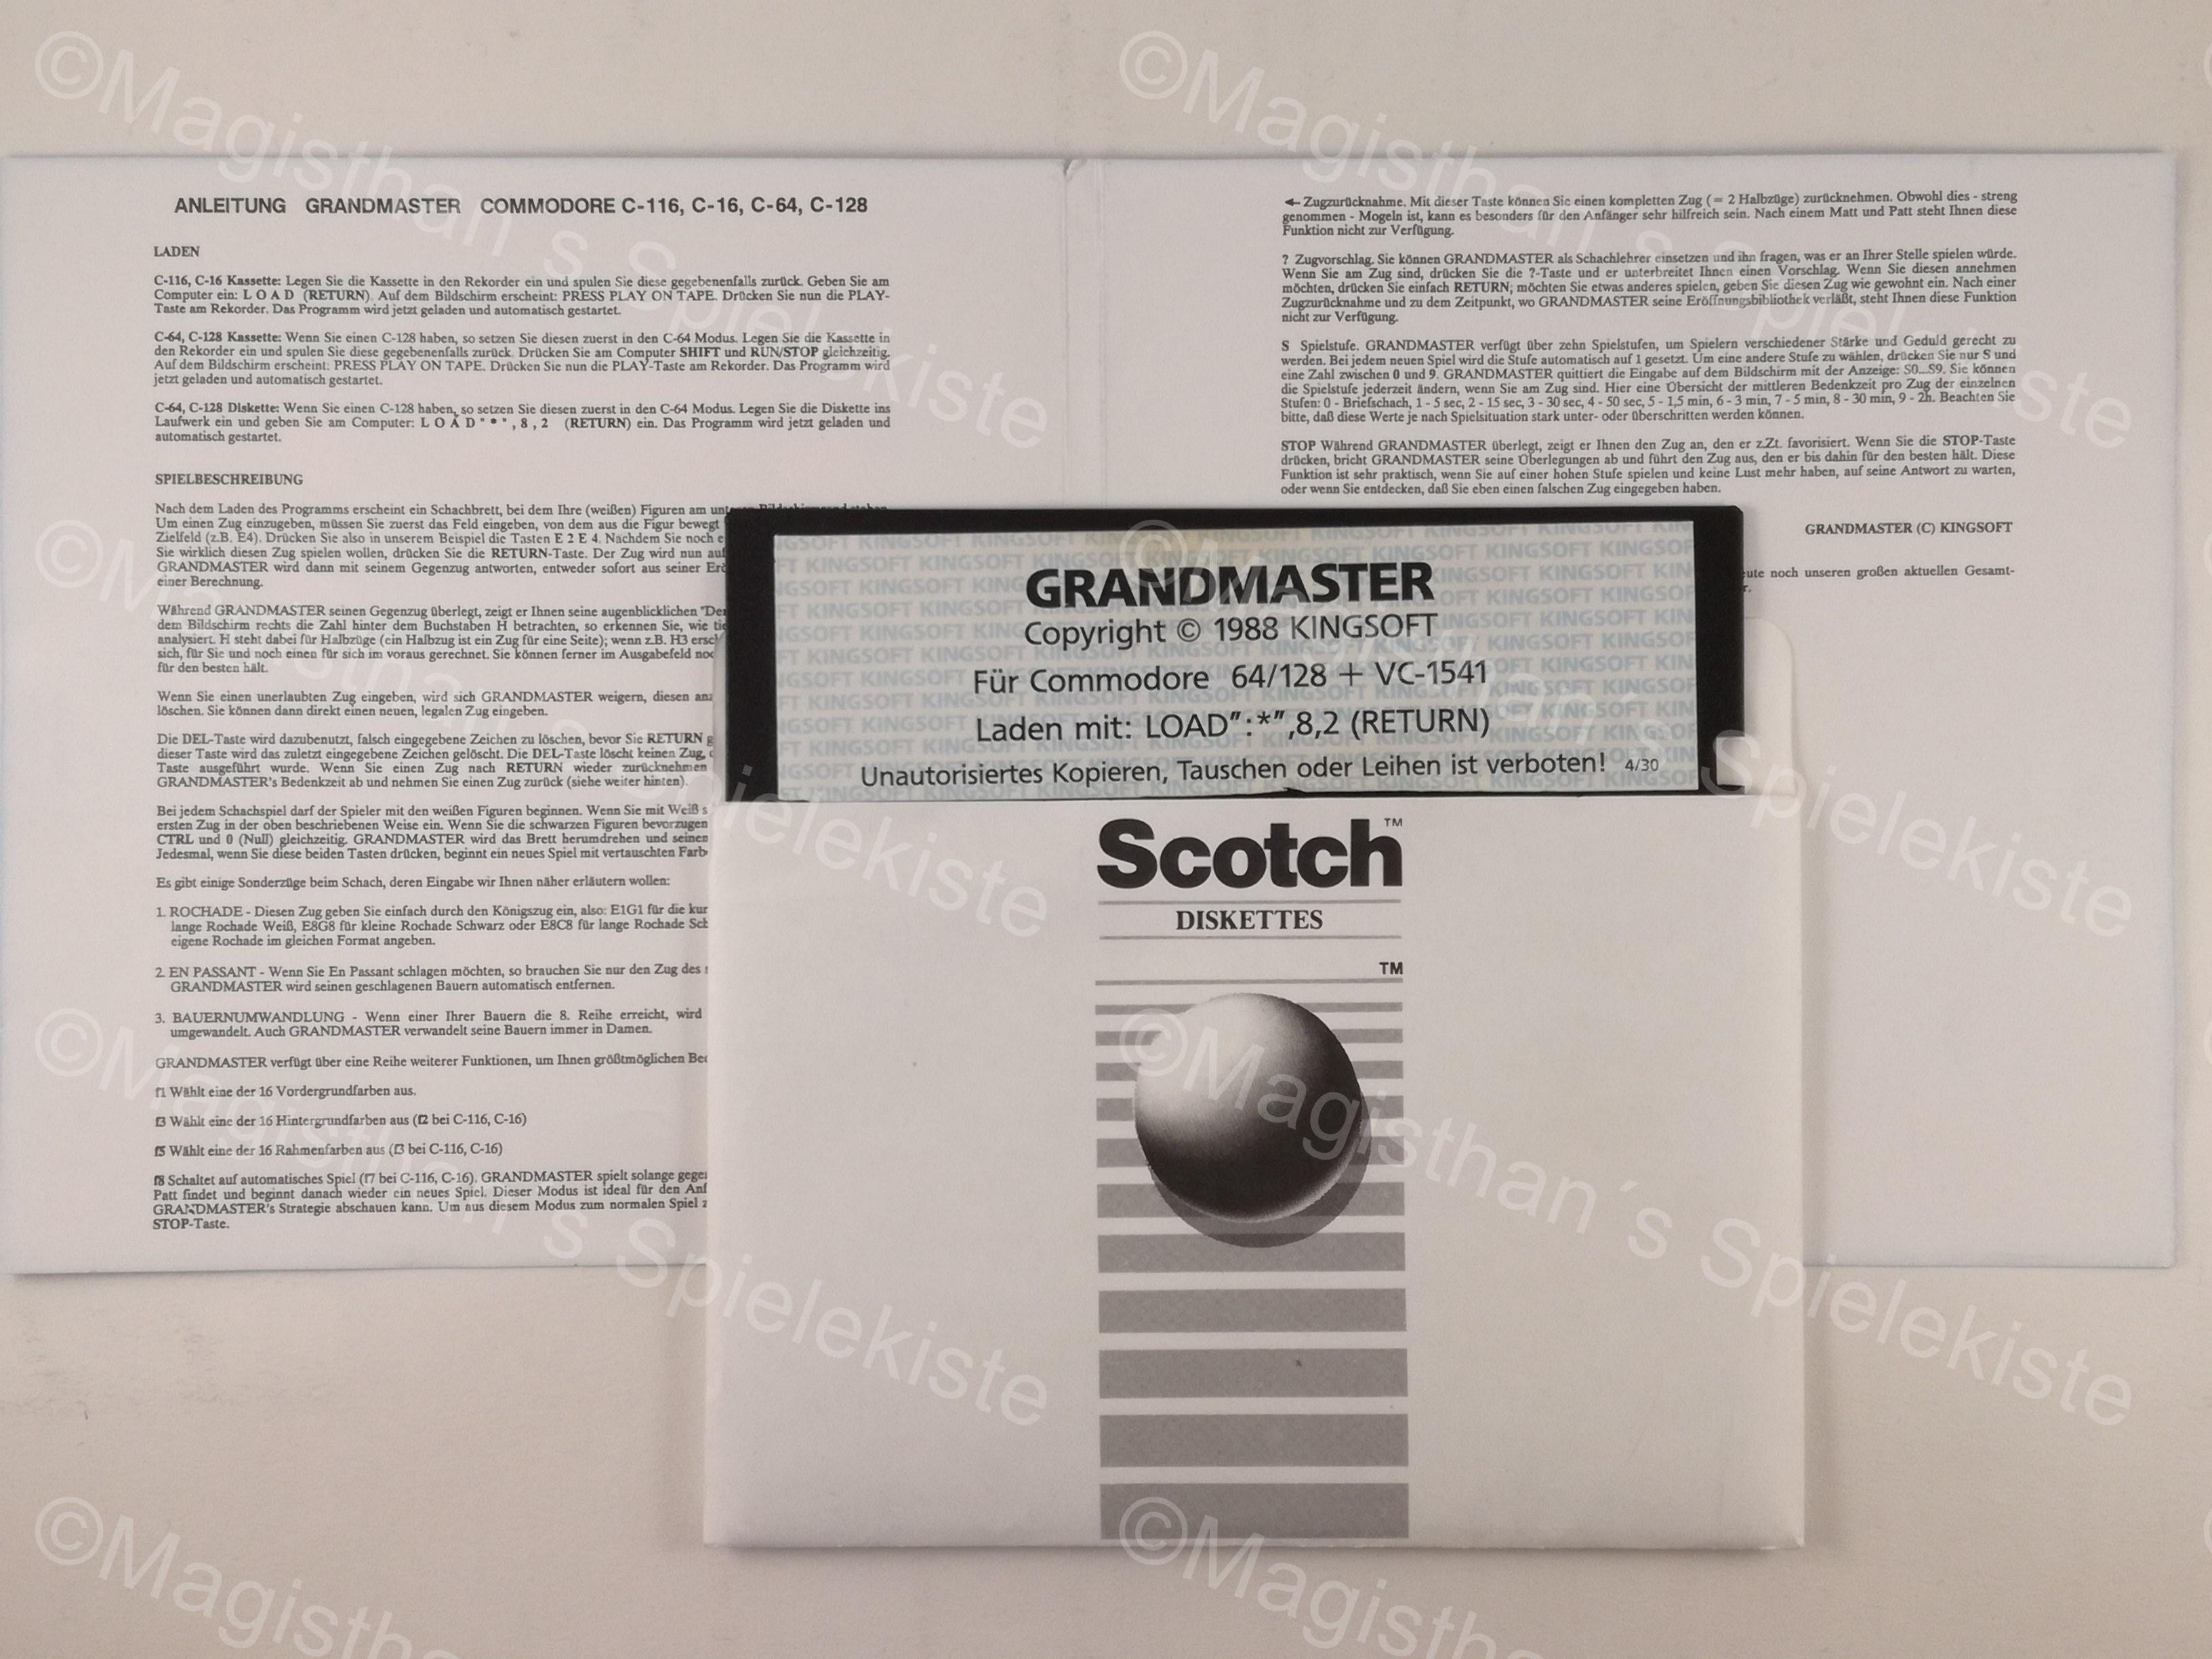 GrandmasterC642.jpg